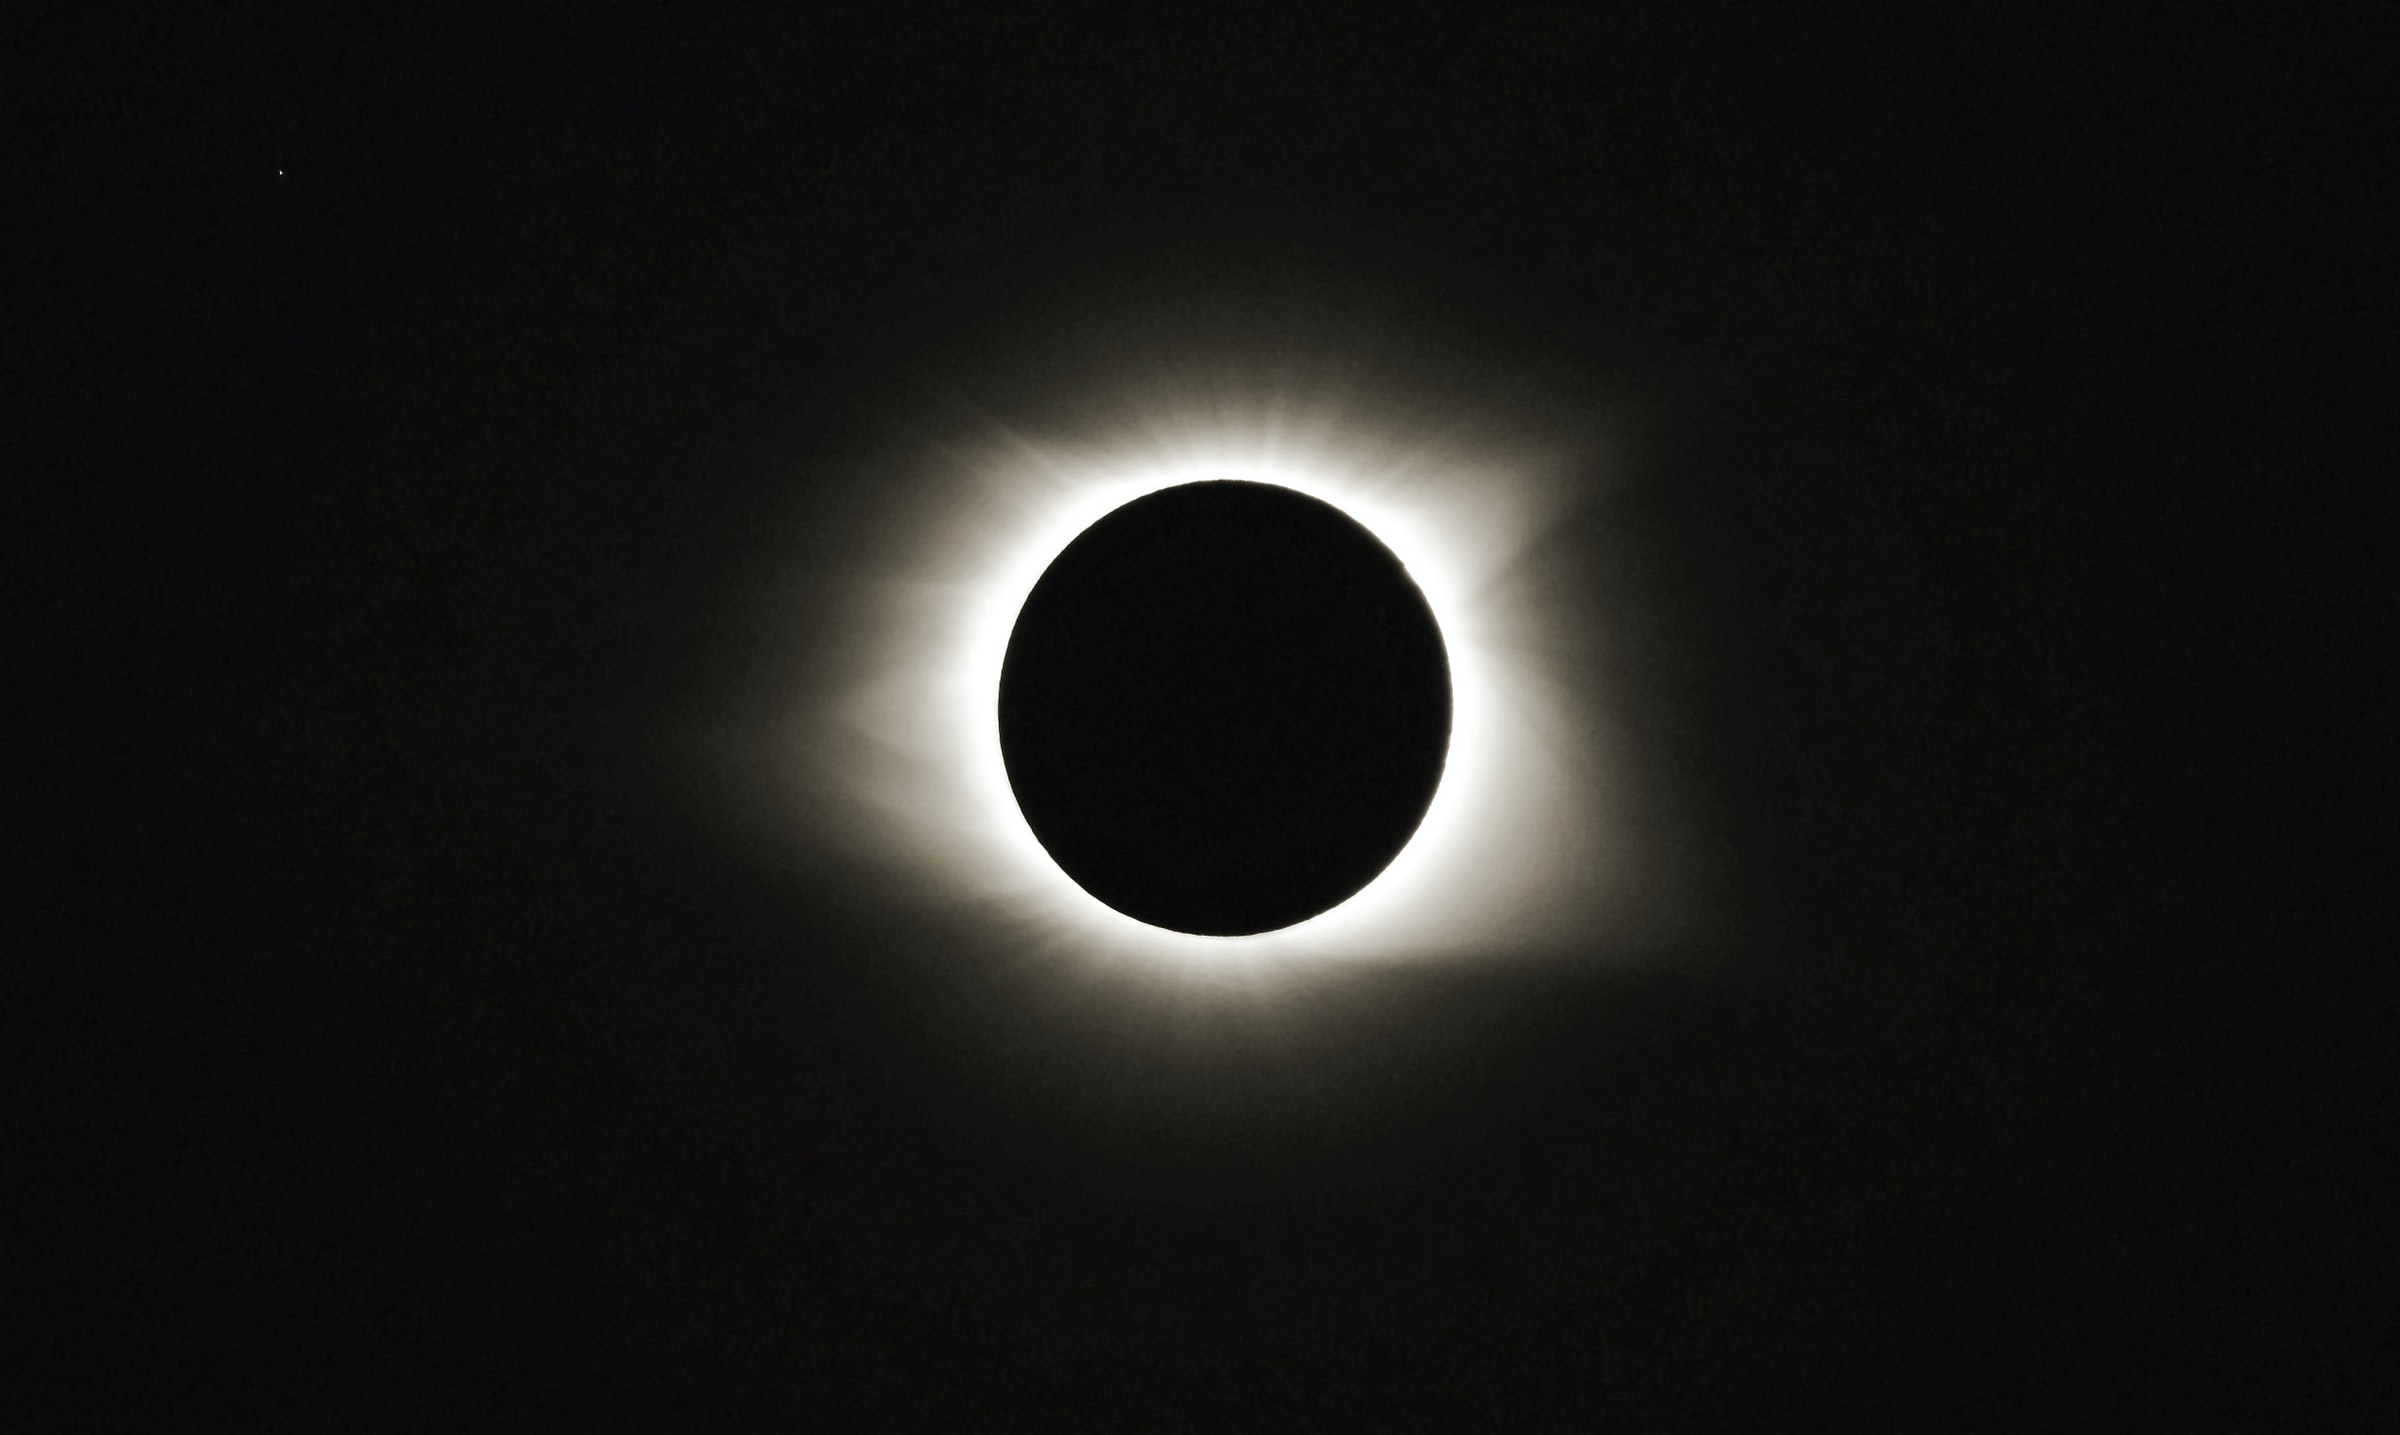 Eclipse _ By Jan Haerer